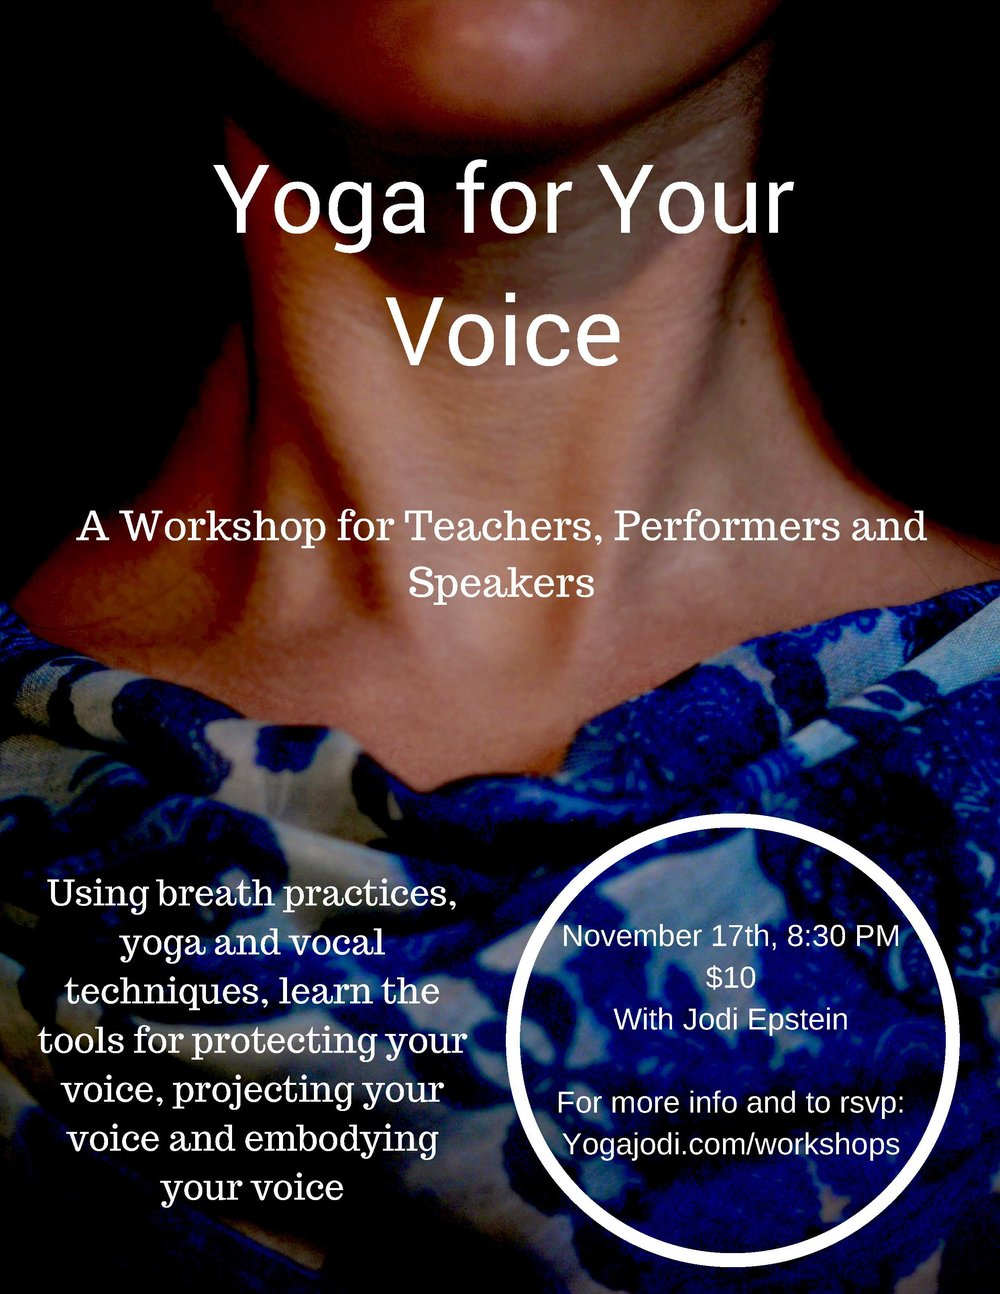 YogaforVoice jpeg.jpg